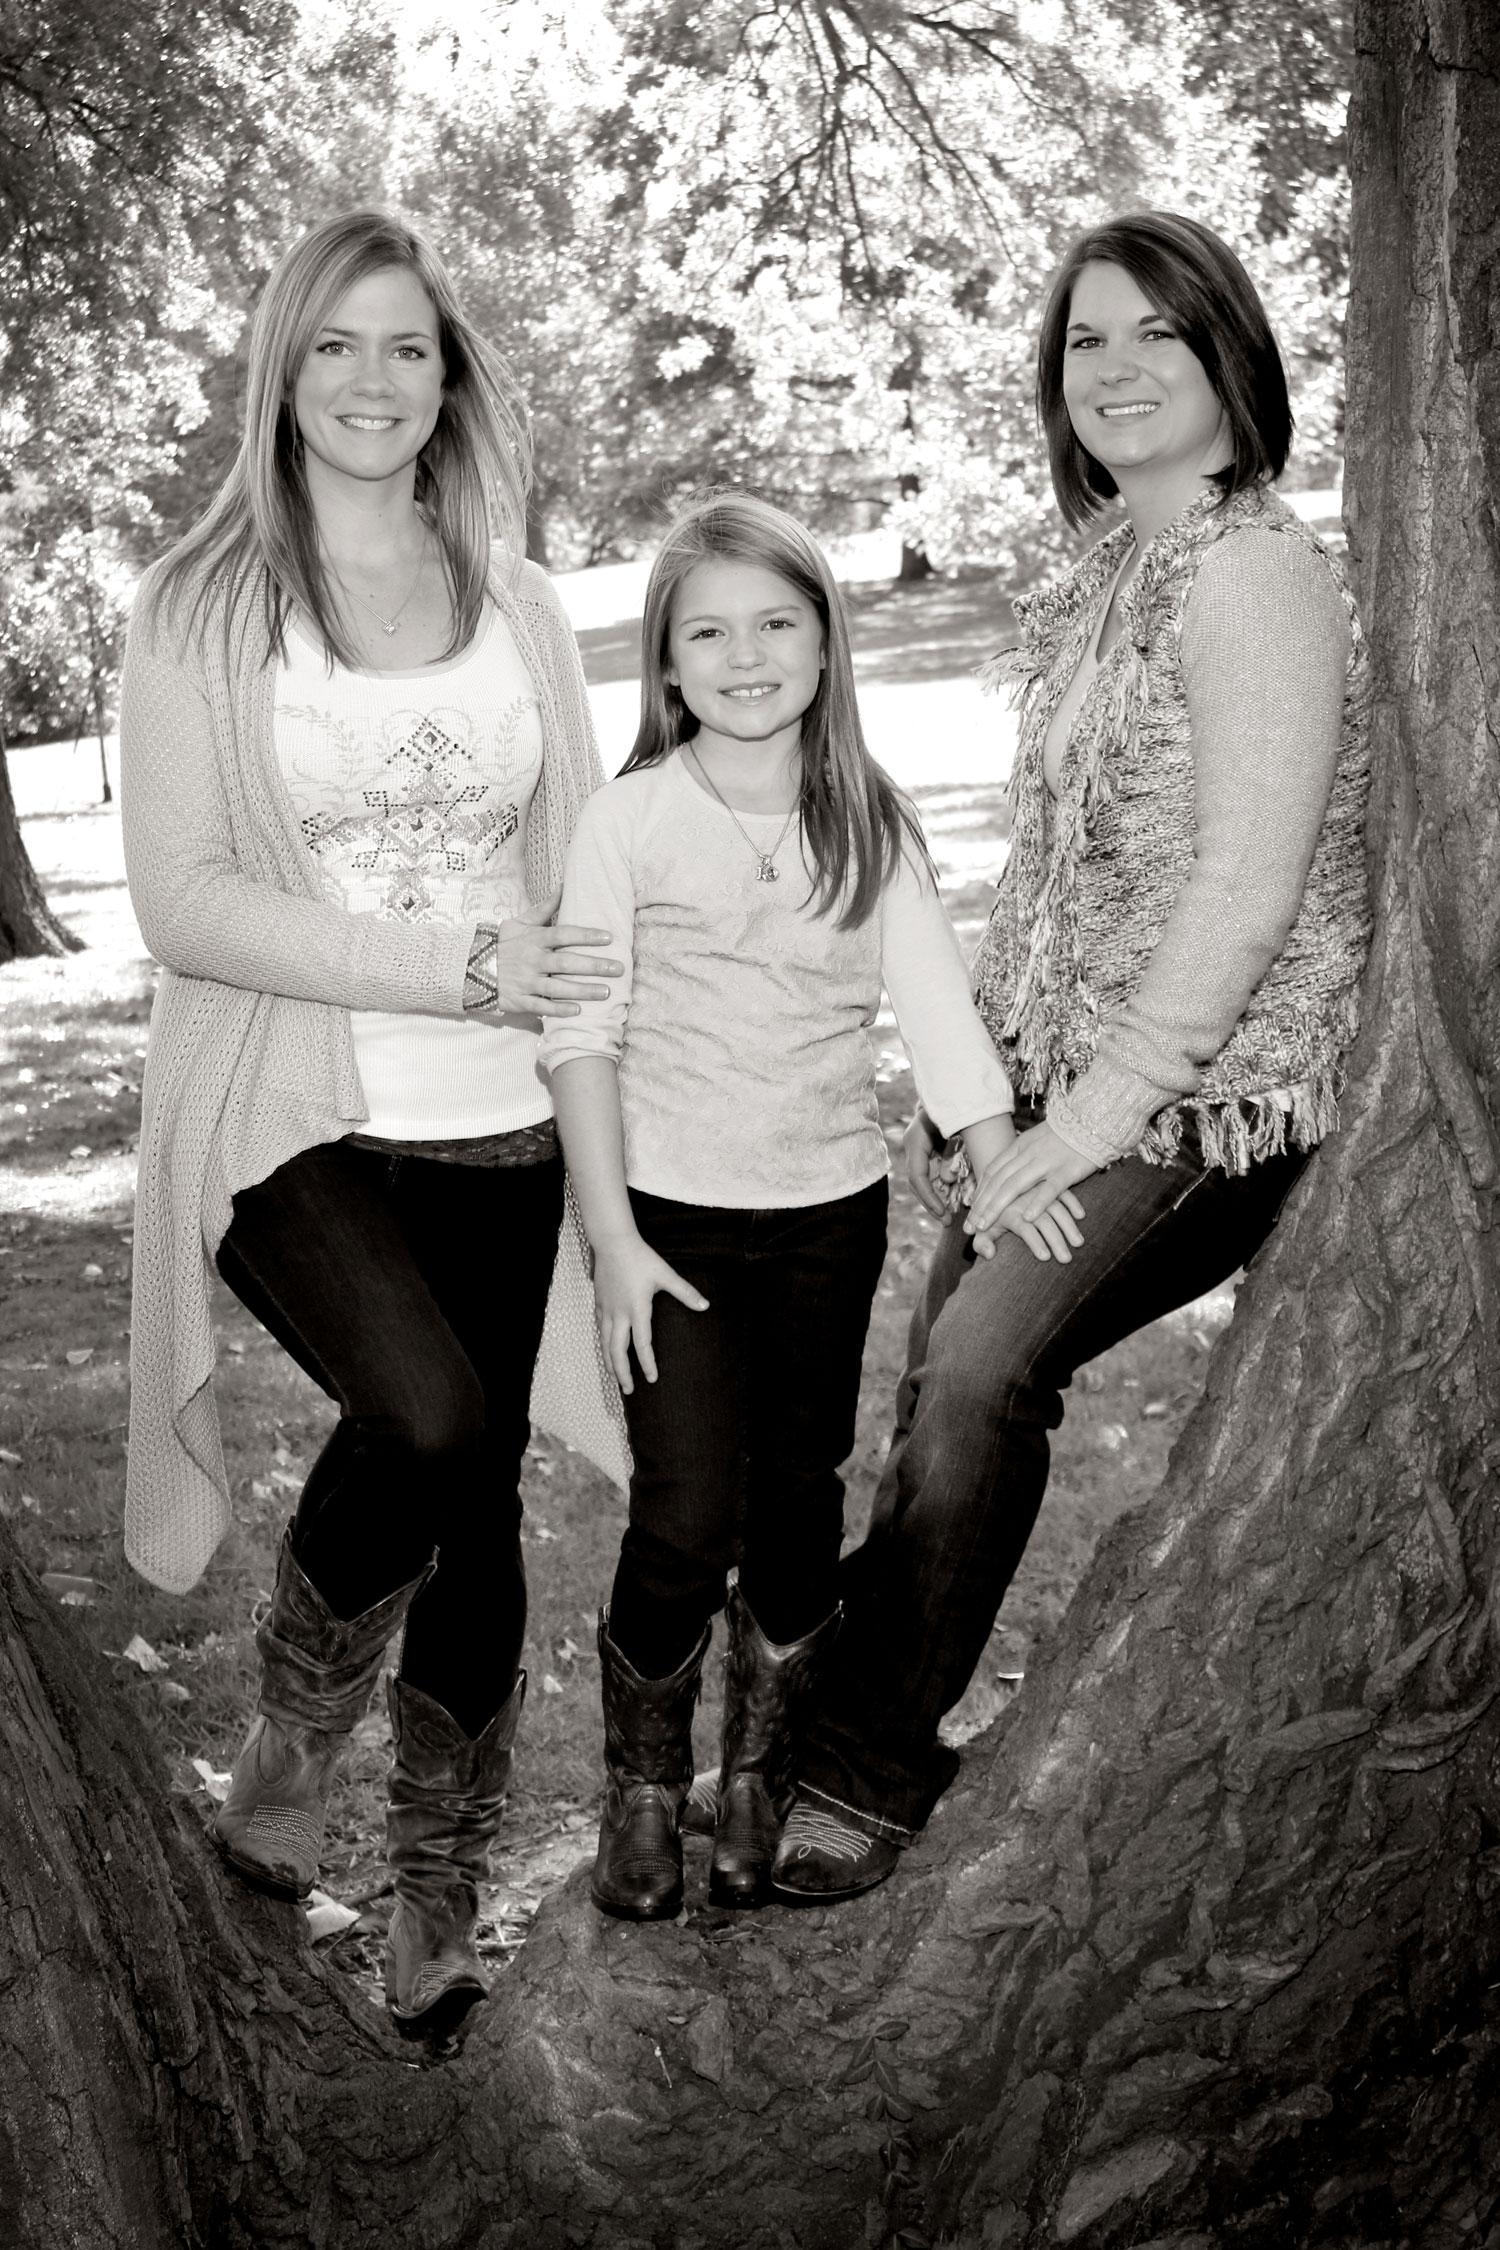 lesbian.couple.family.portraits.professional.jpg